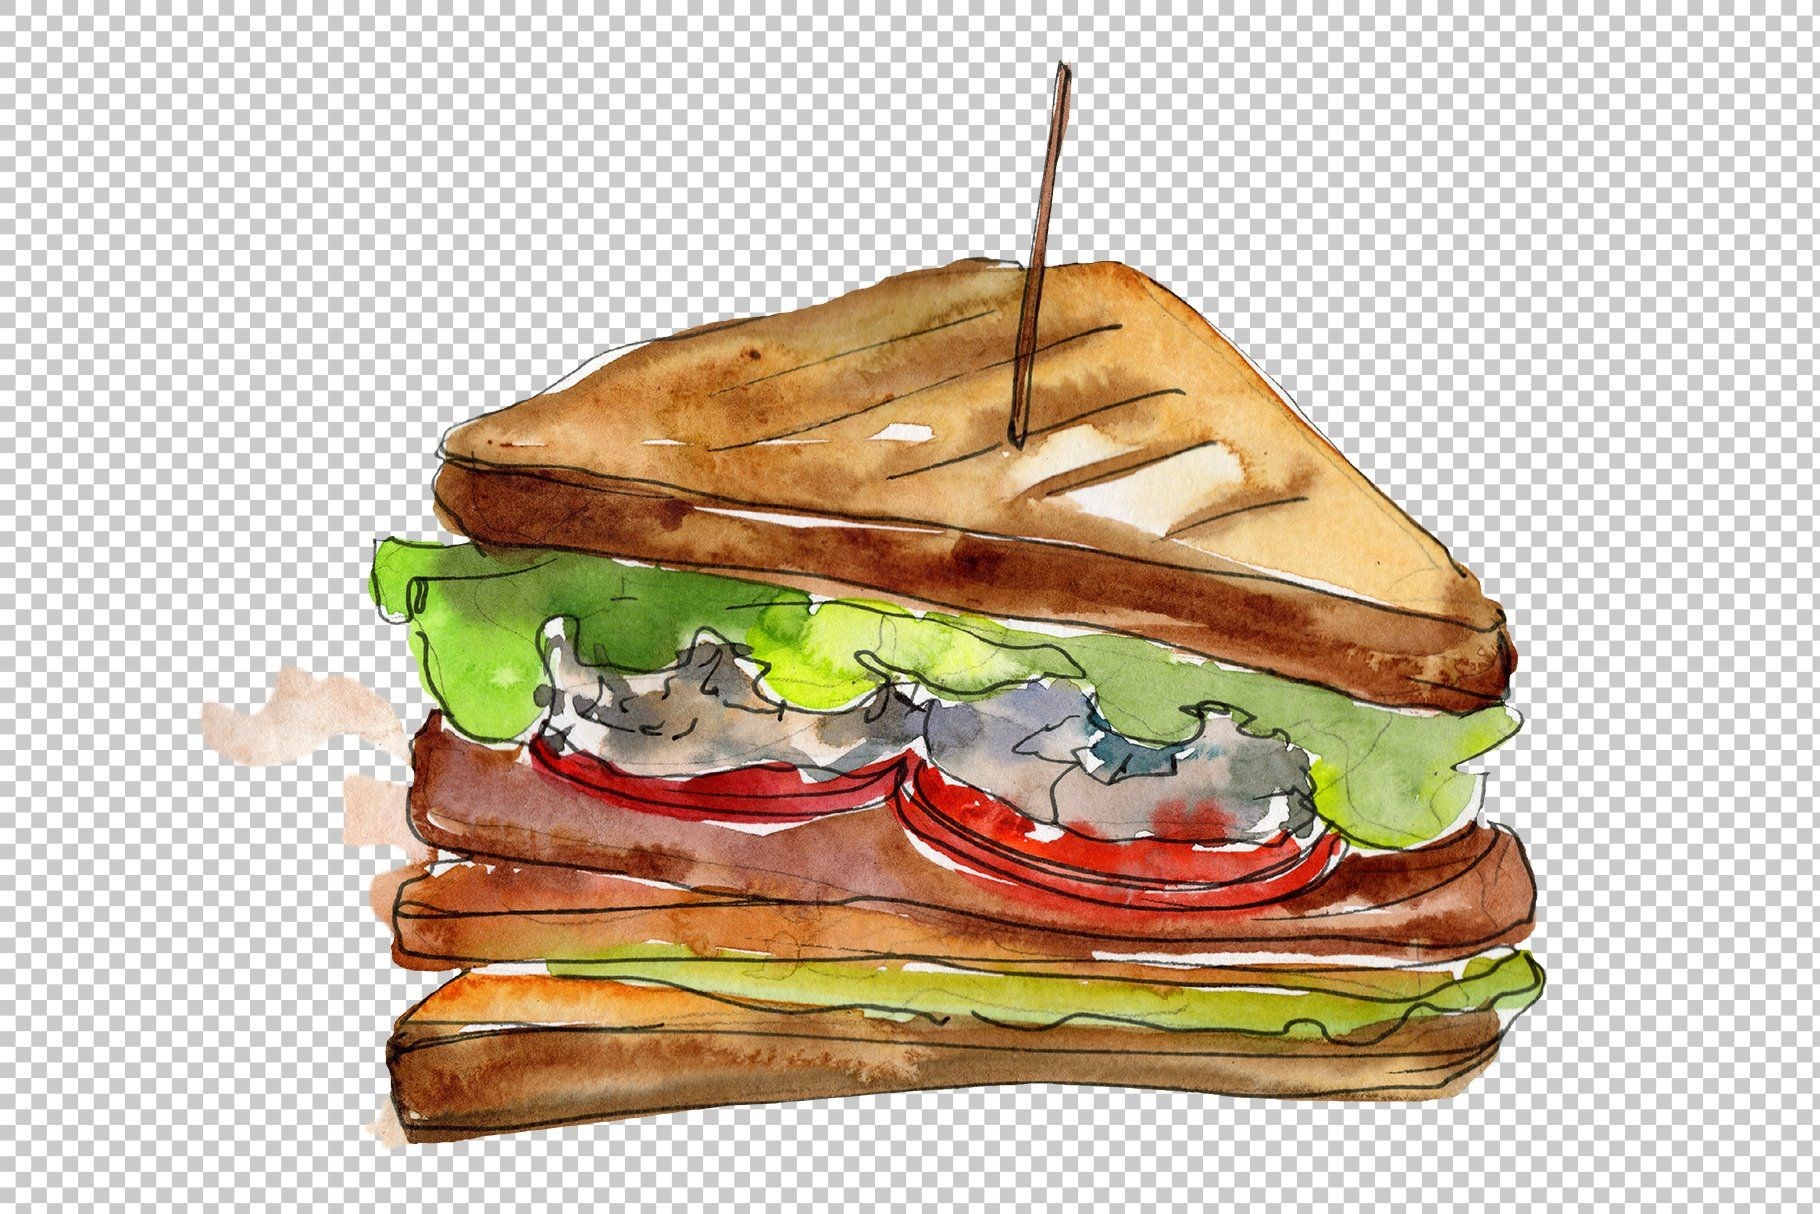 Tasty Sandwich Png Watercolor Set Delicious Sandwiches Tasty Sandwiches